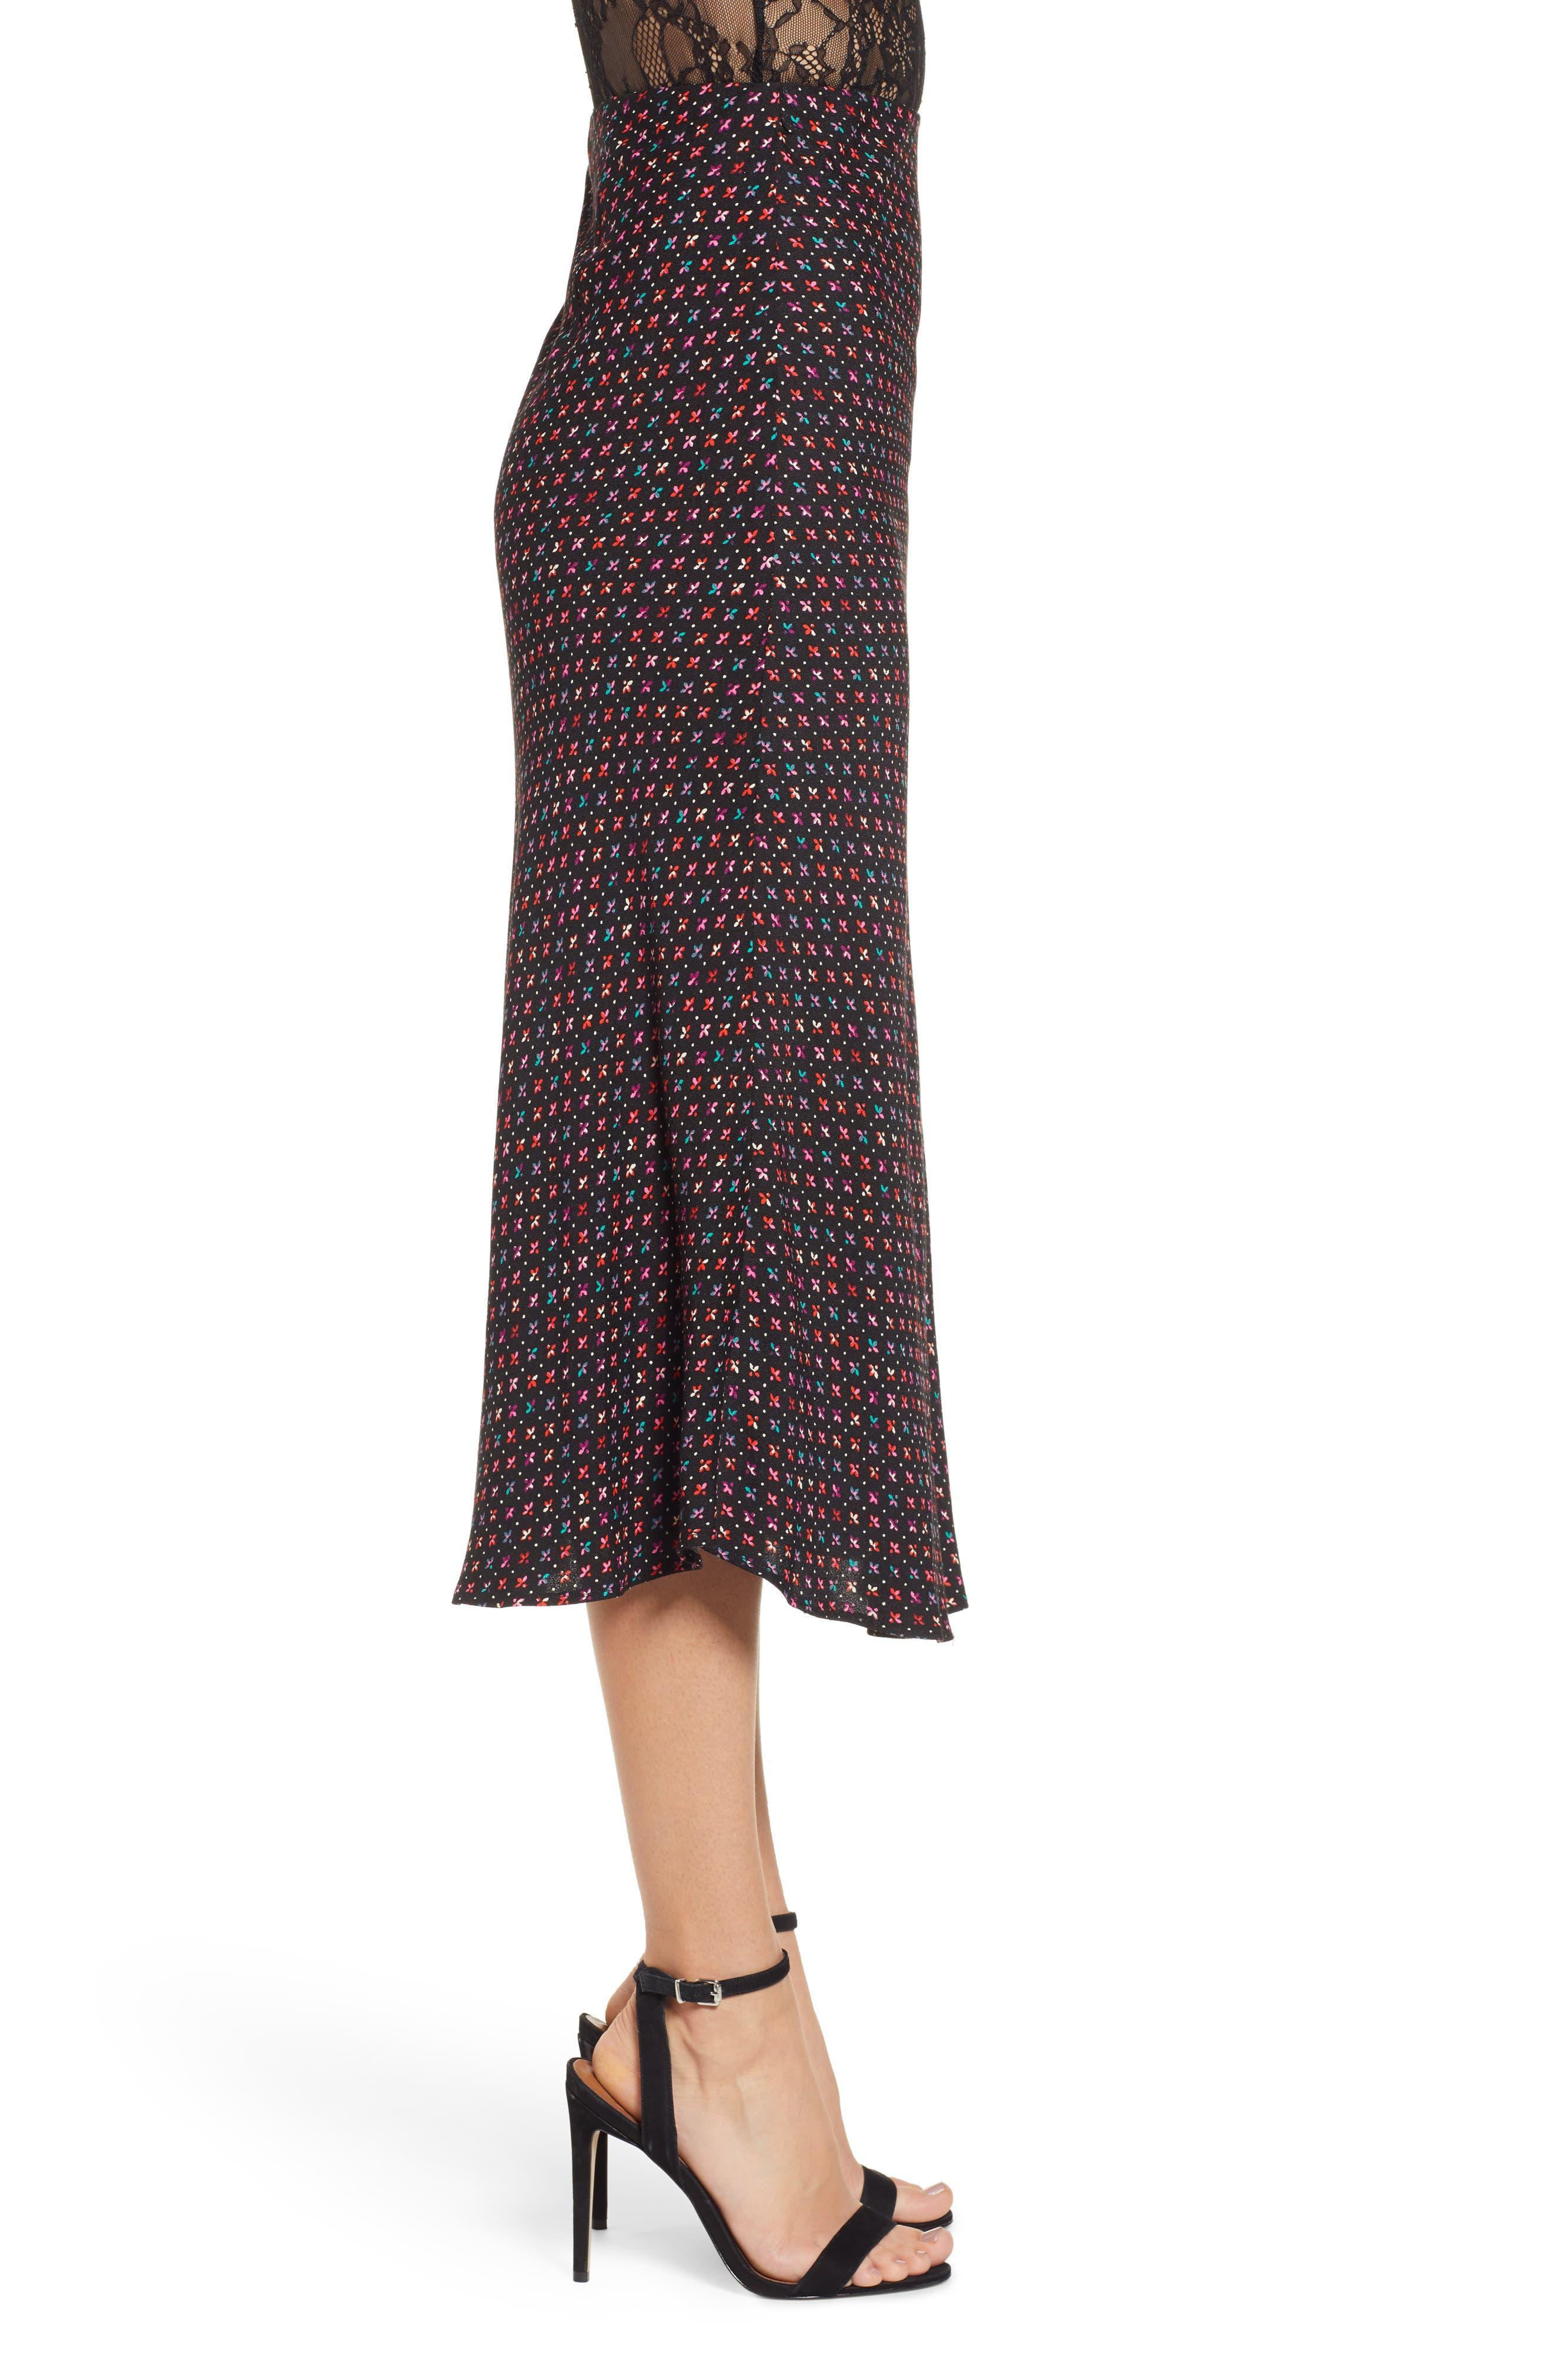 AFRM, Brynne Print Midi Skirt, Alternate thumbnail 3, color, 001